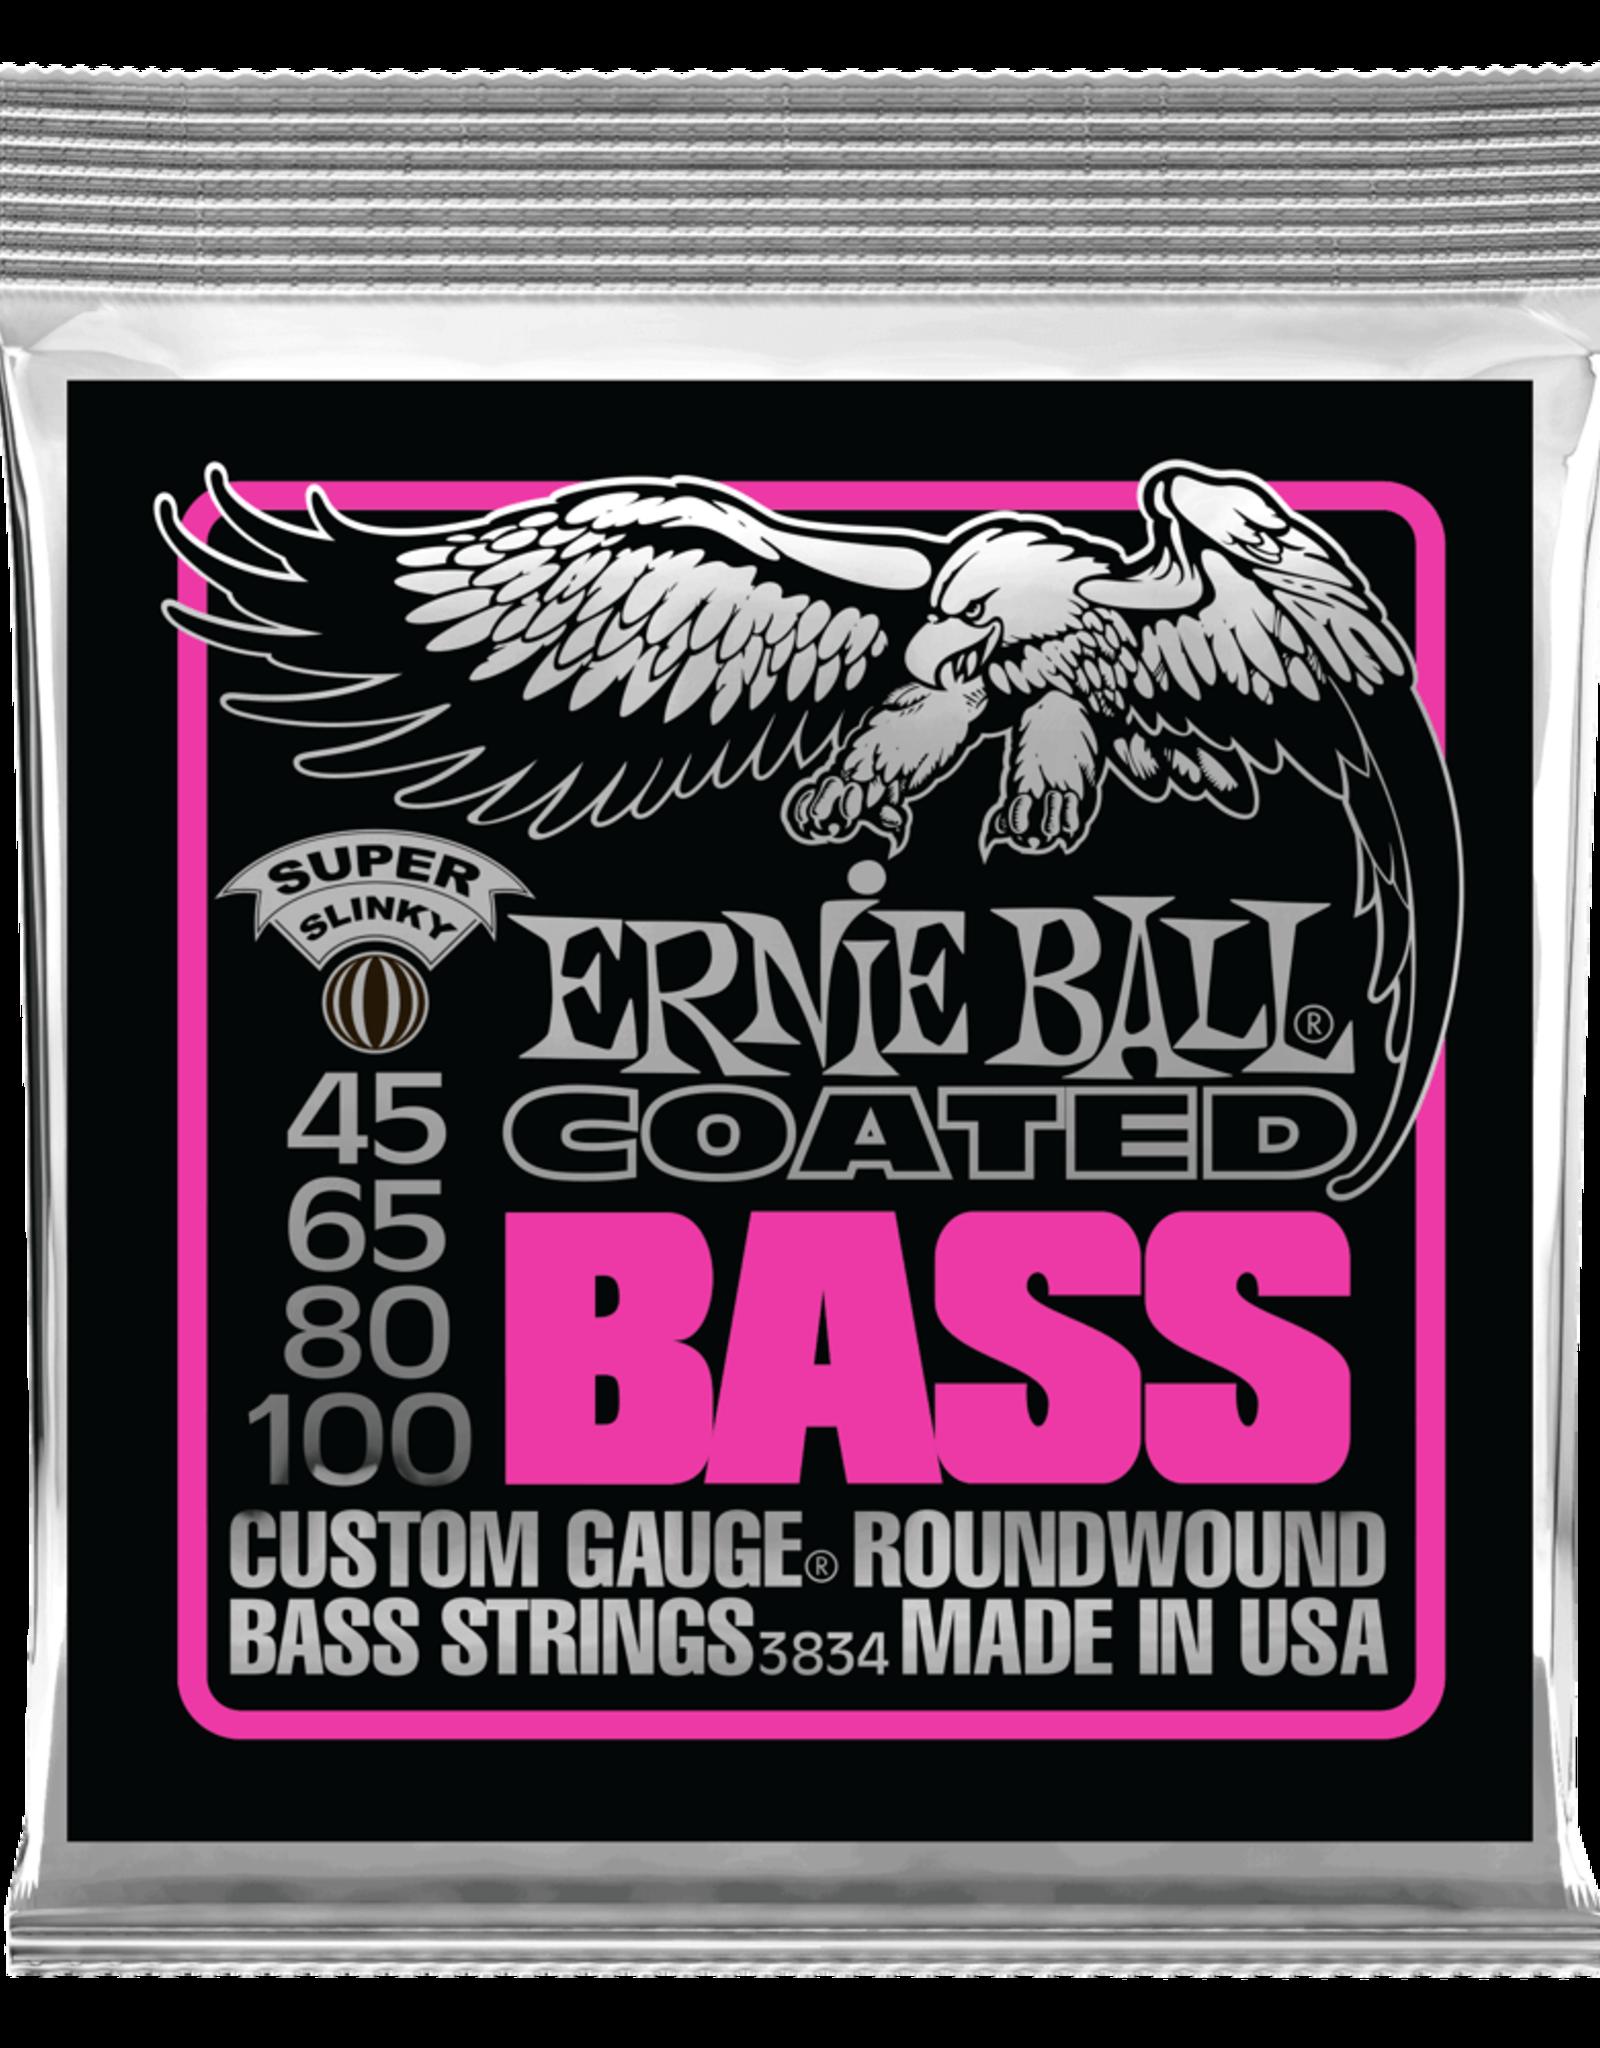 Ernie Ball Super Slinky Coated Electric Bass Strings, 45-100